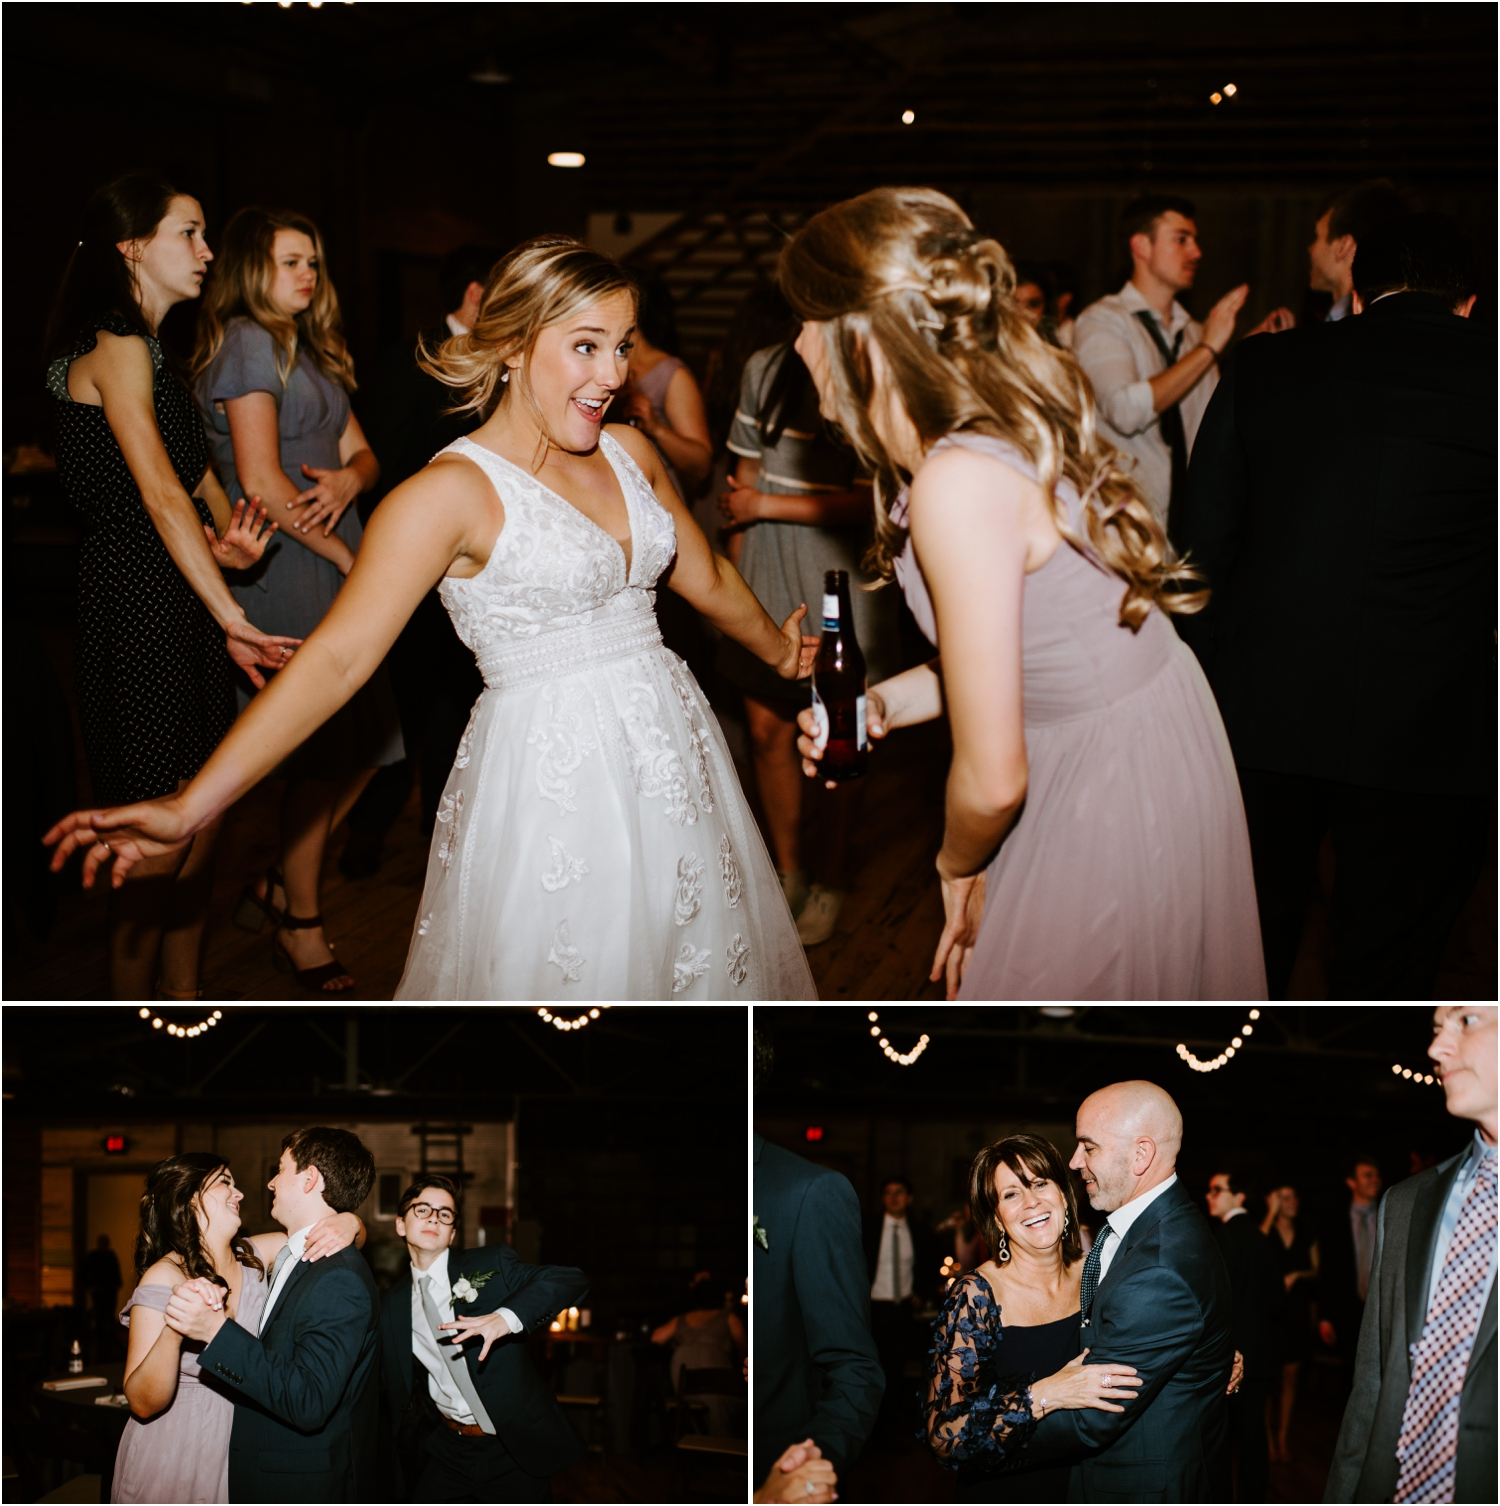 weddingreception_0191.jpg